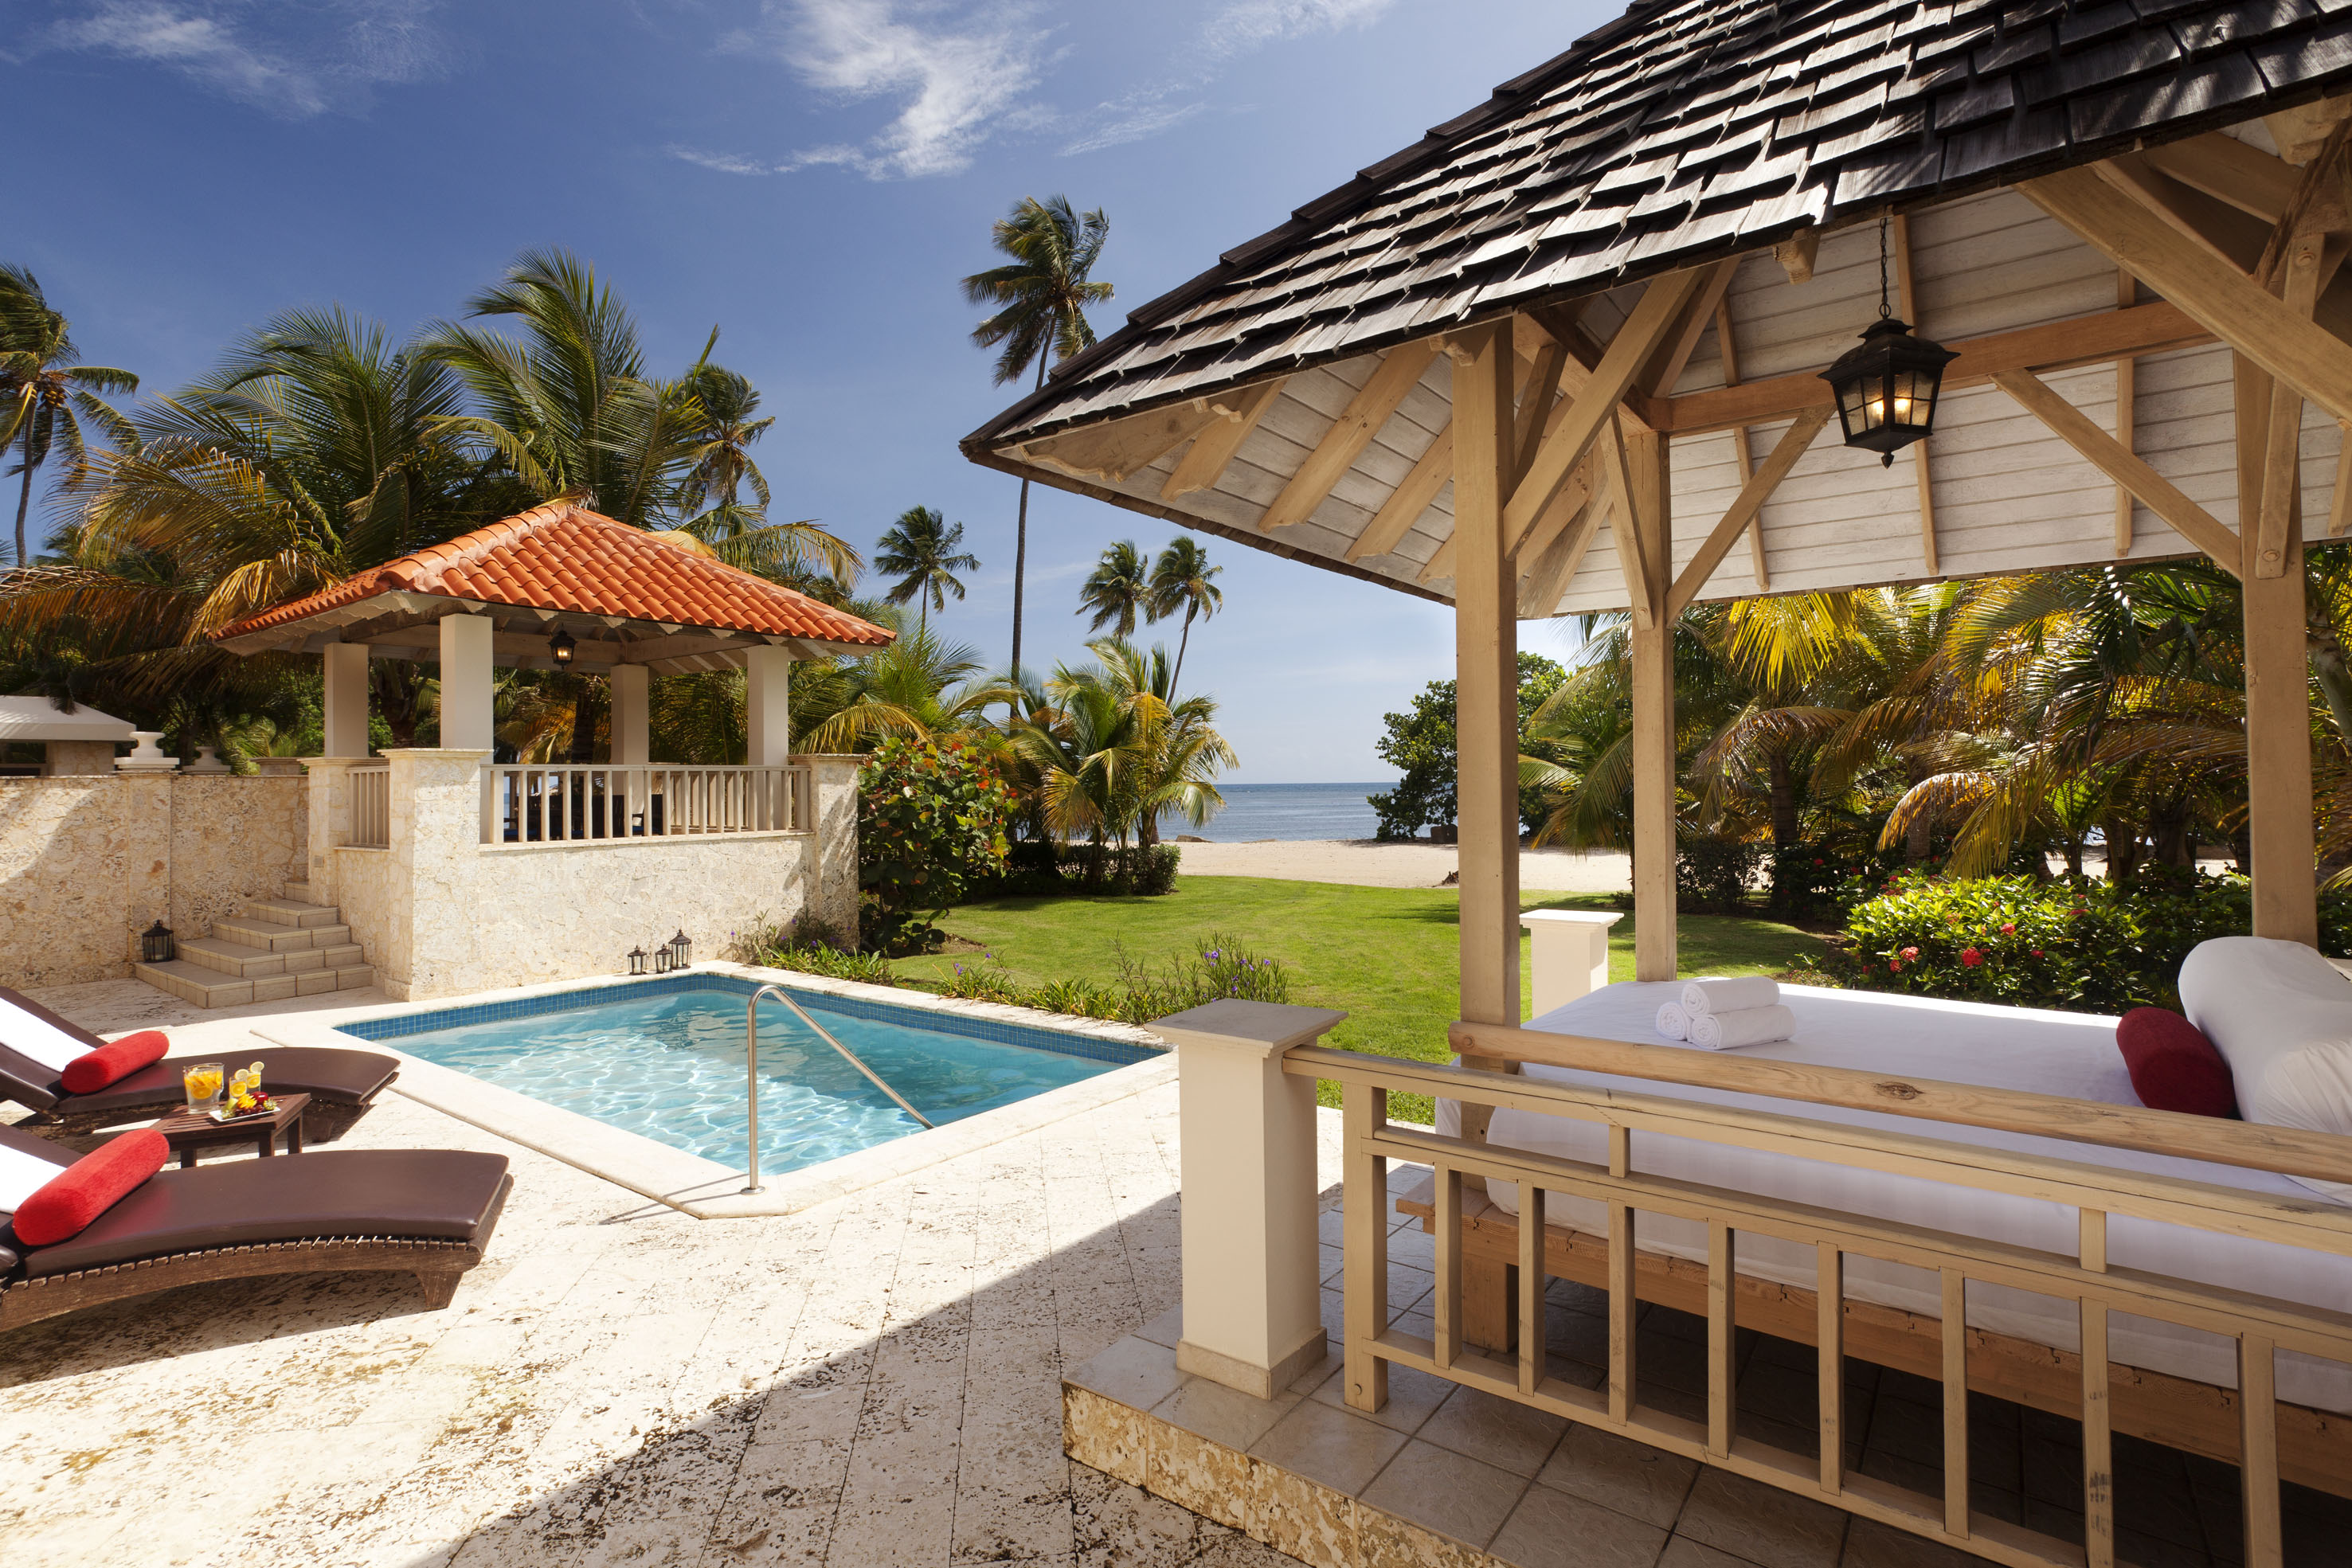 Melia hotels resorts rebrands puerto rico retreat for Gran melia hotel